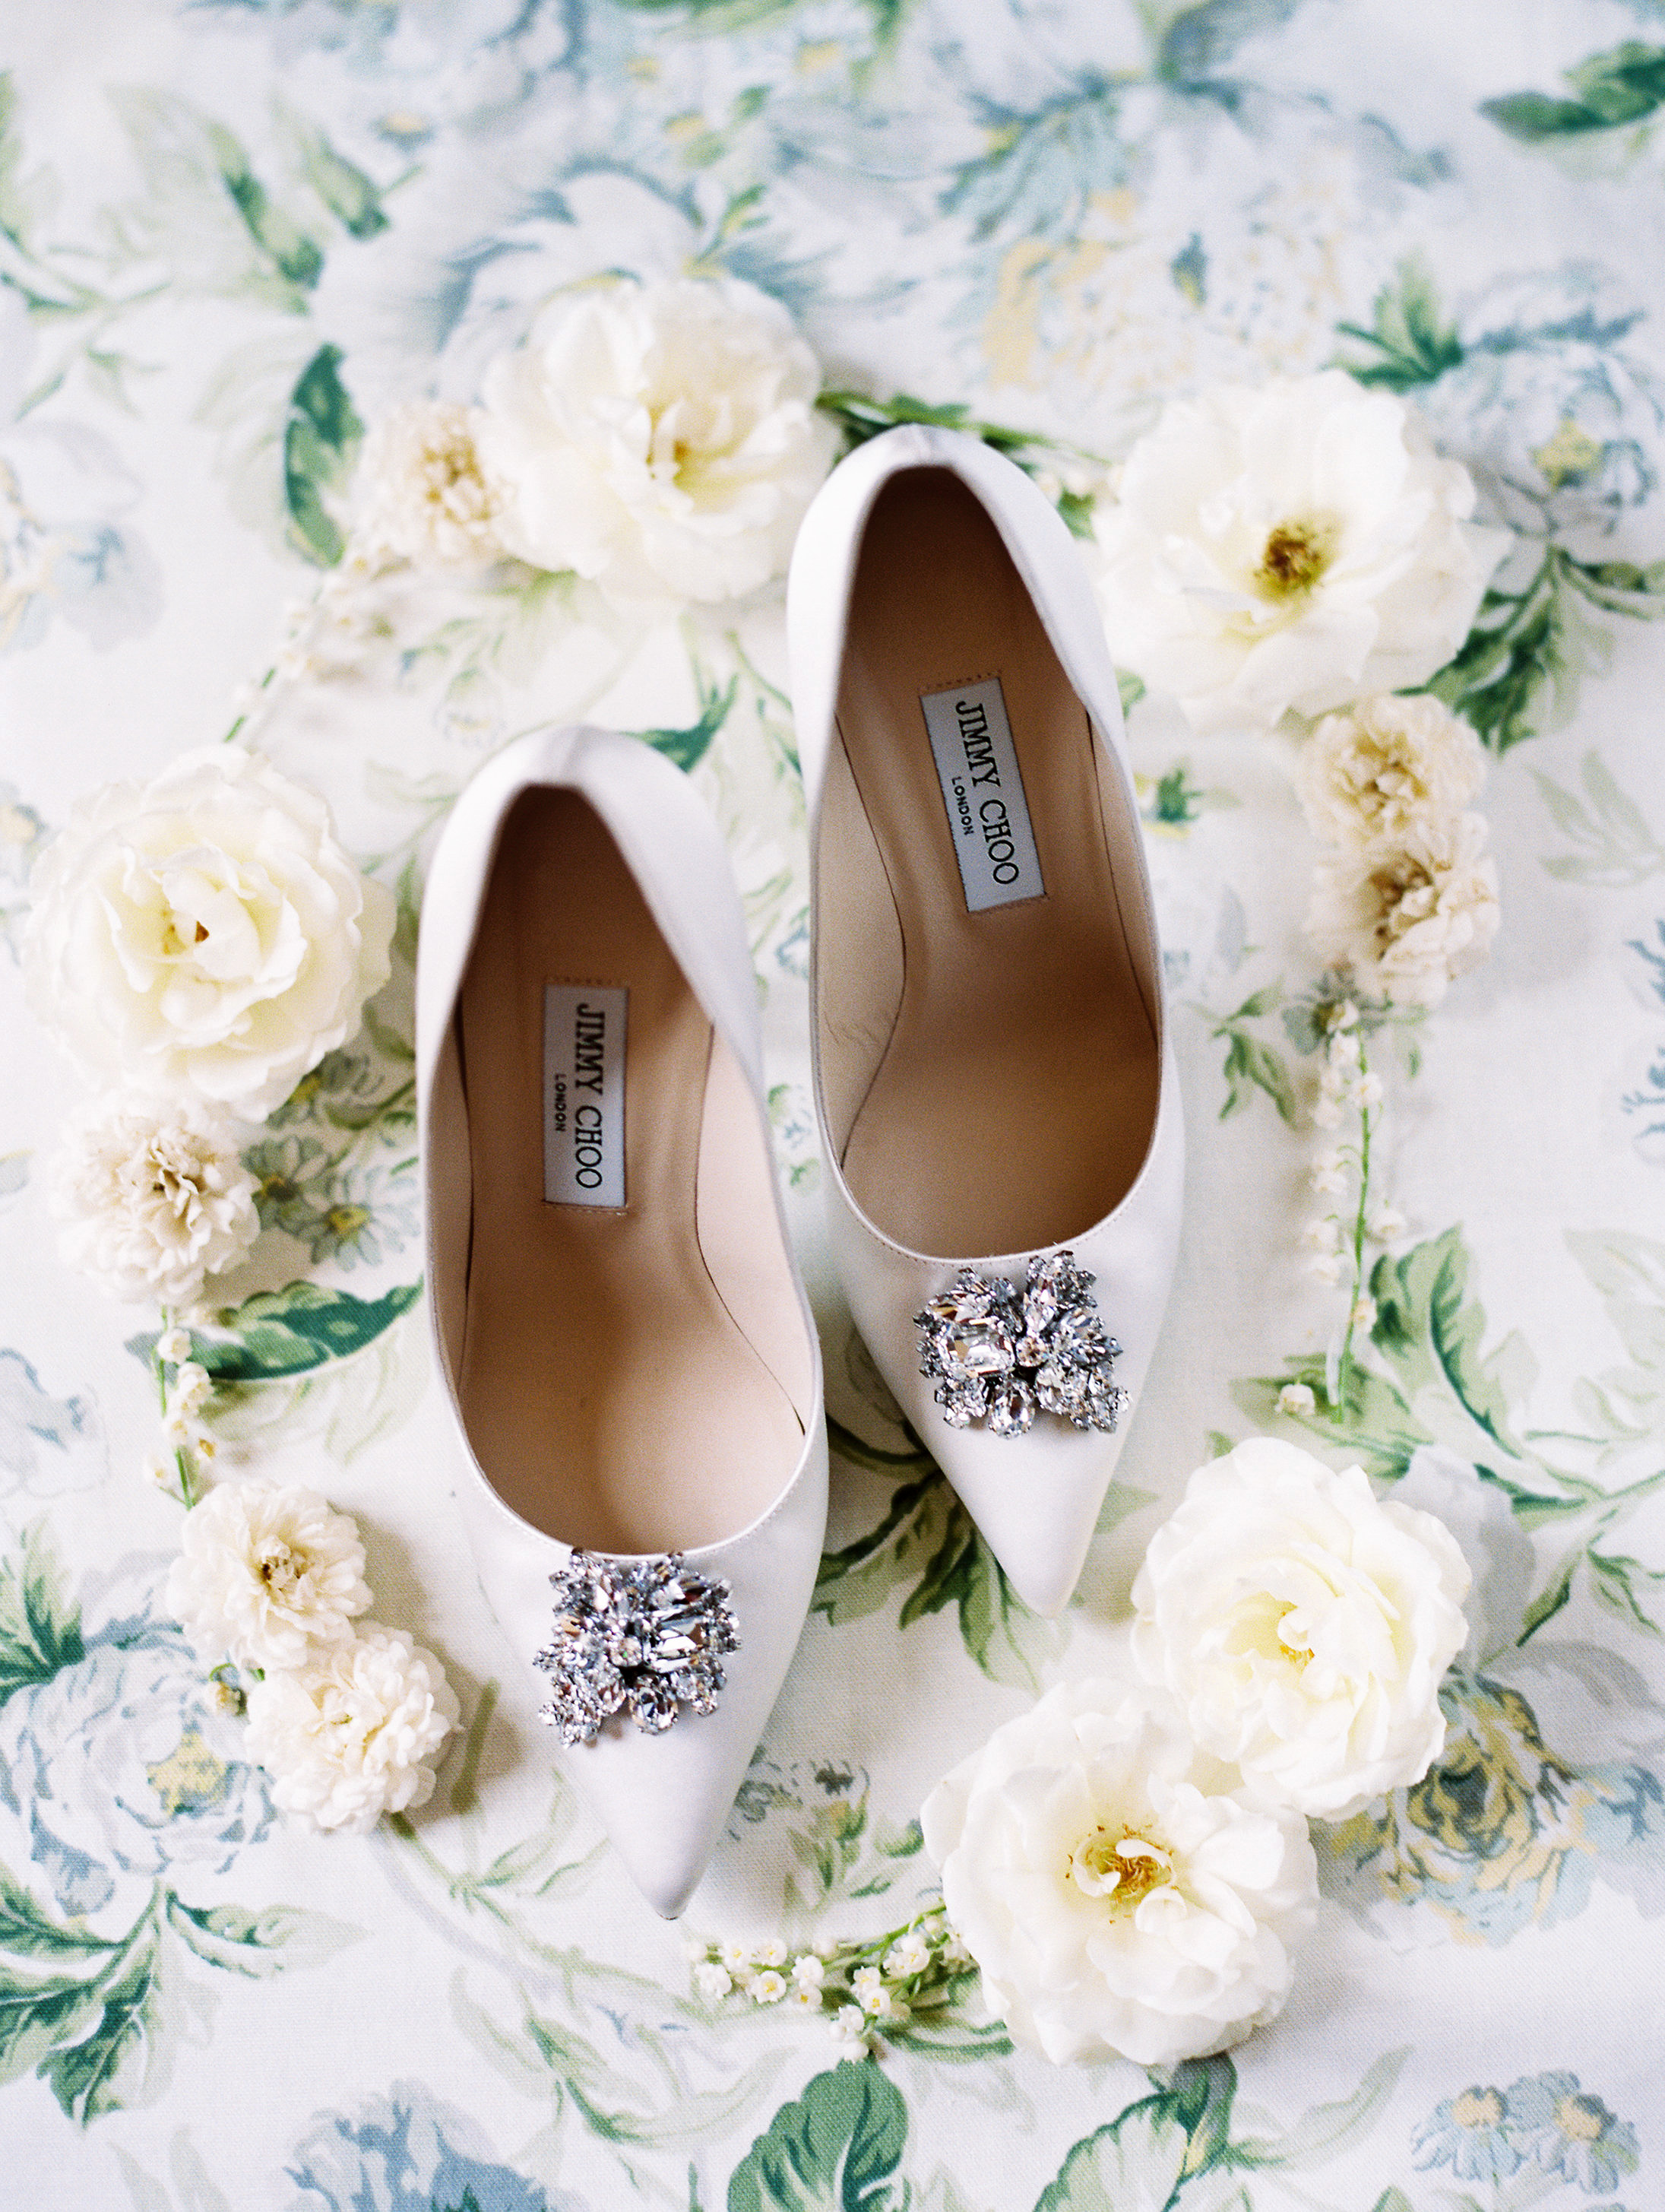 ramsey charles ireland wedding shoes high heels